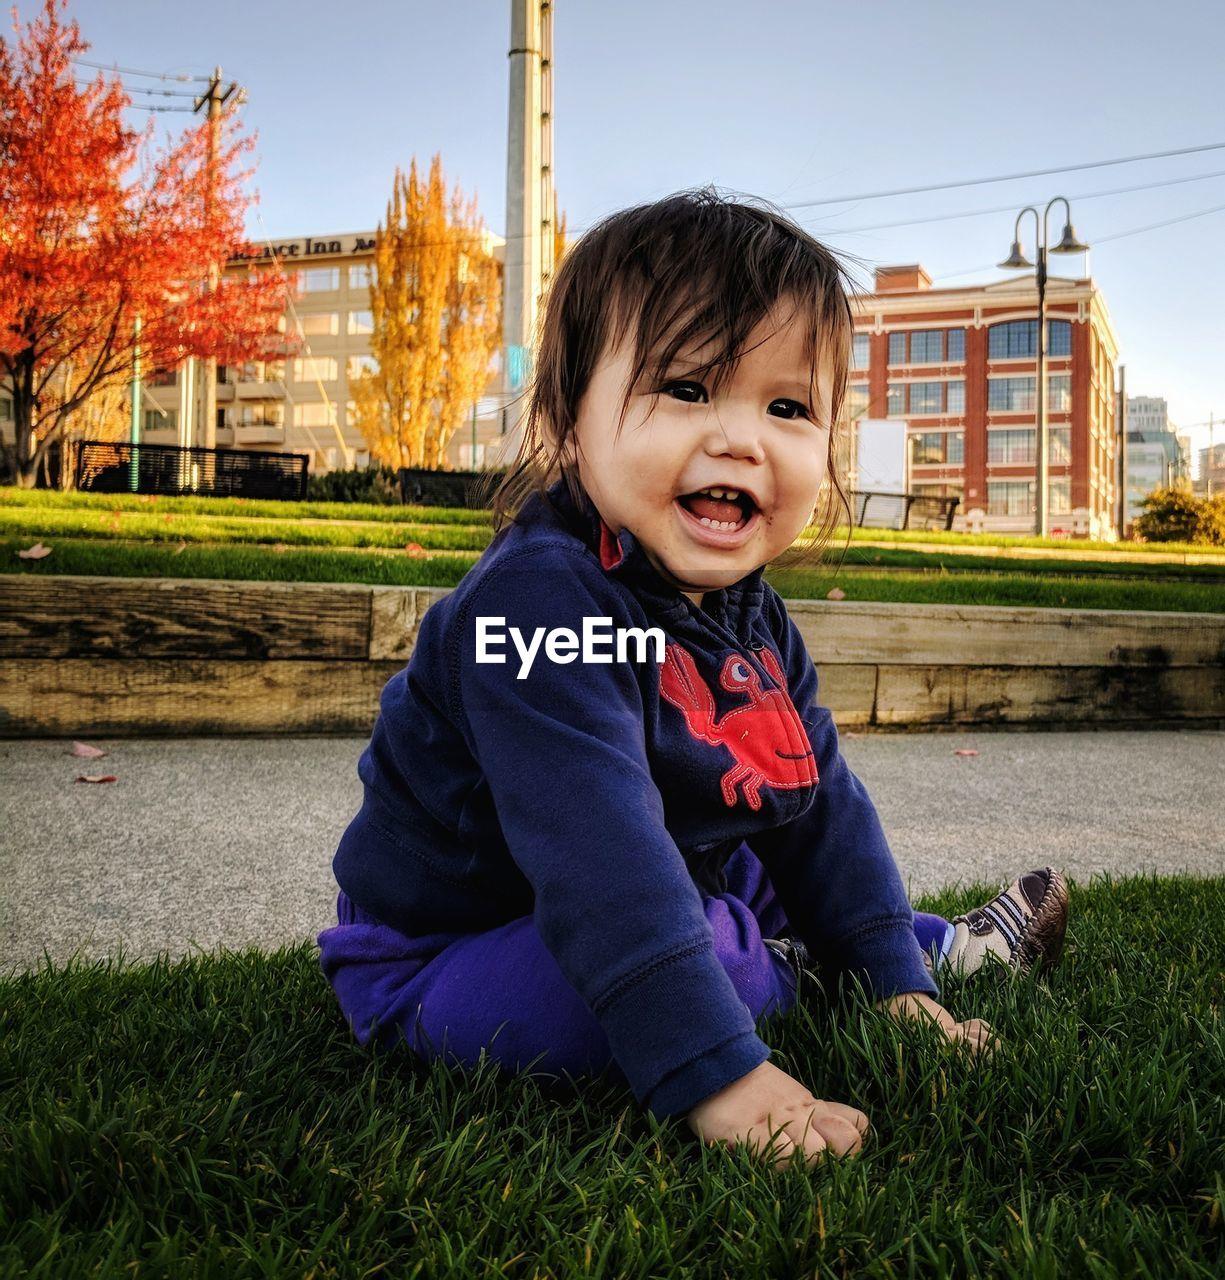 PORTRAIT OF CUTE SMILING BOY SITTING ON GRASS